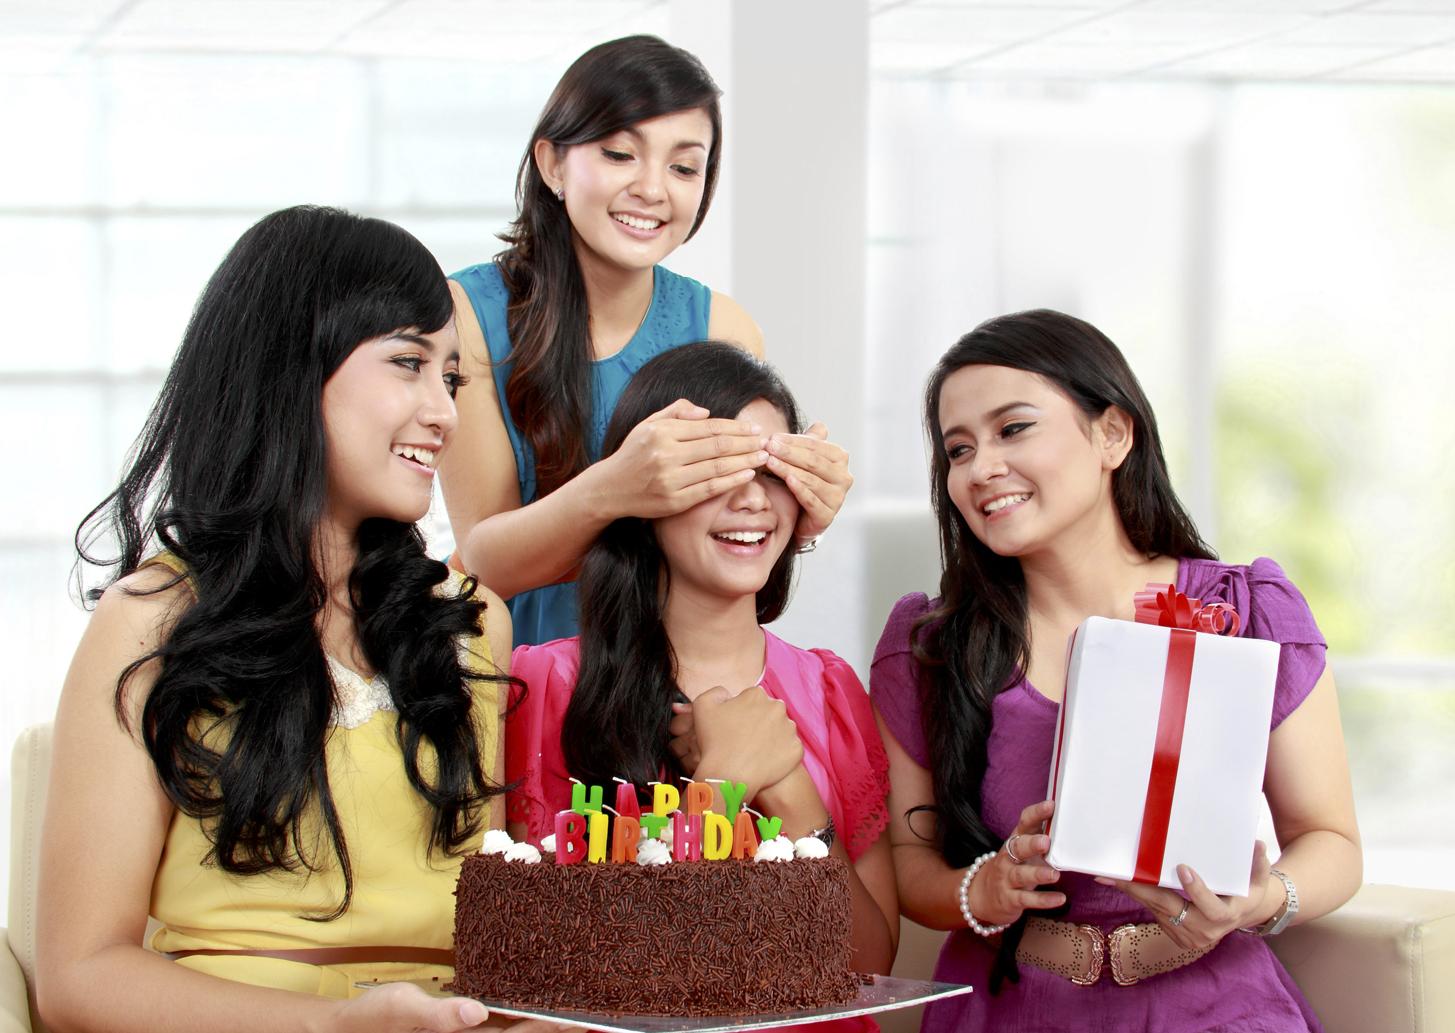 Kiat Melakukan Persiapan Sebelum Pesta Kejutan Ulang Tahun